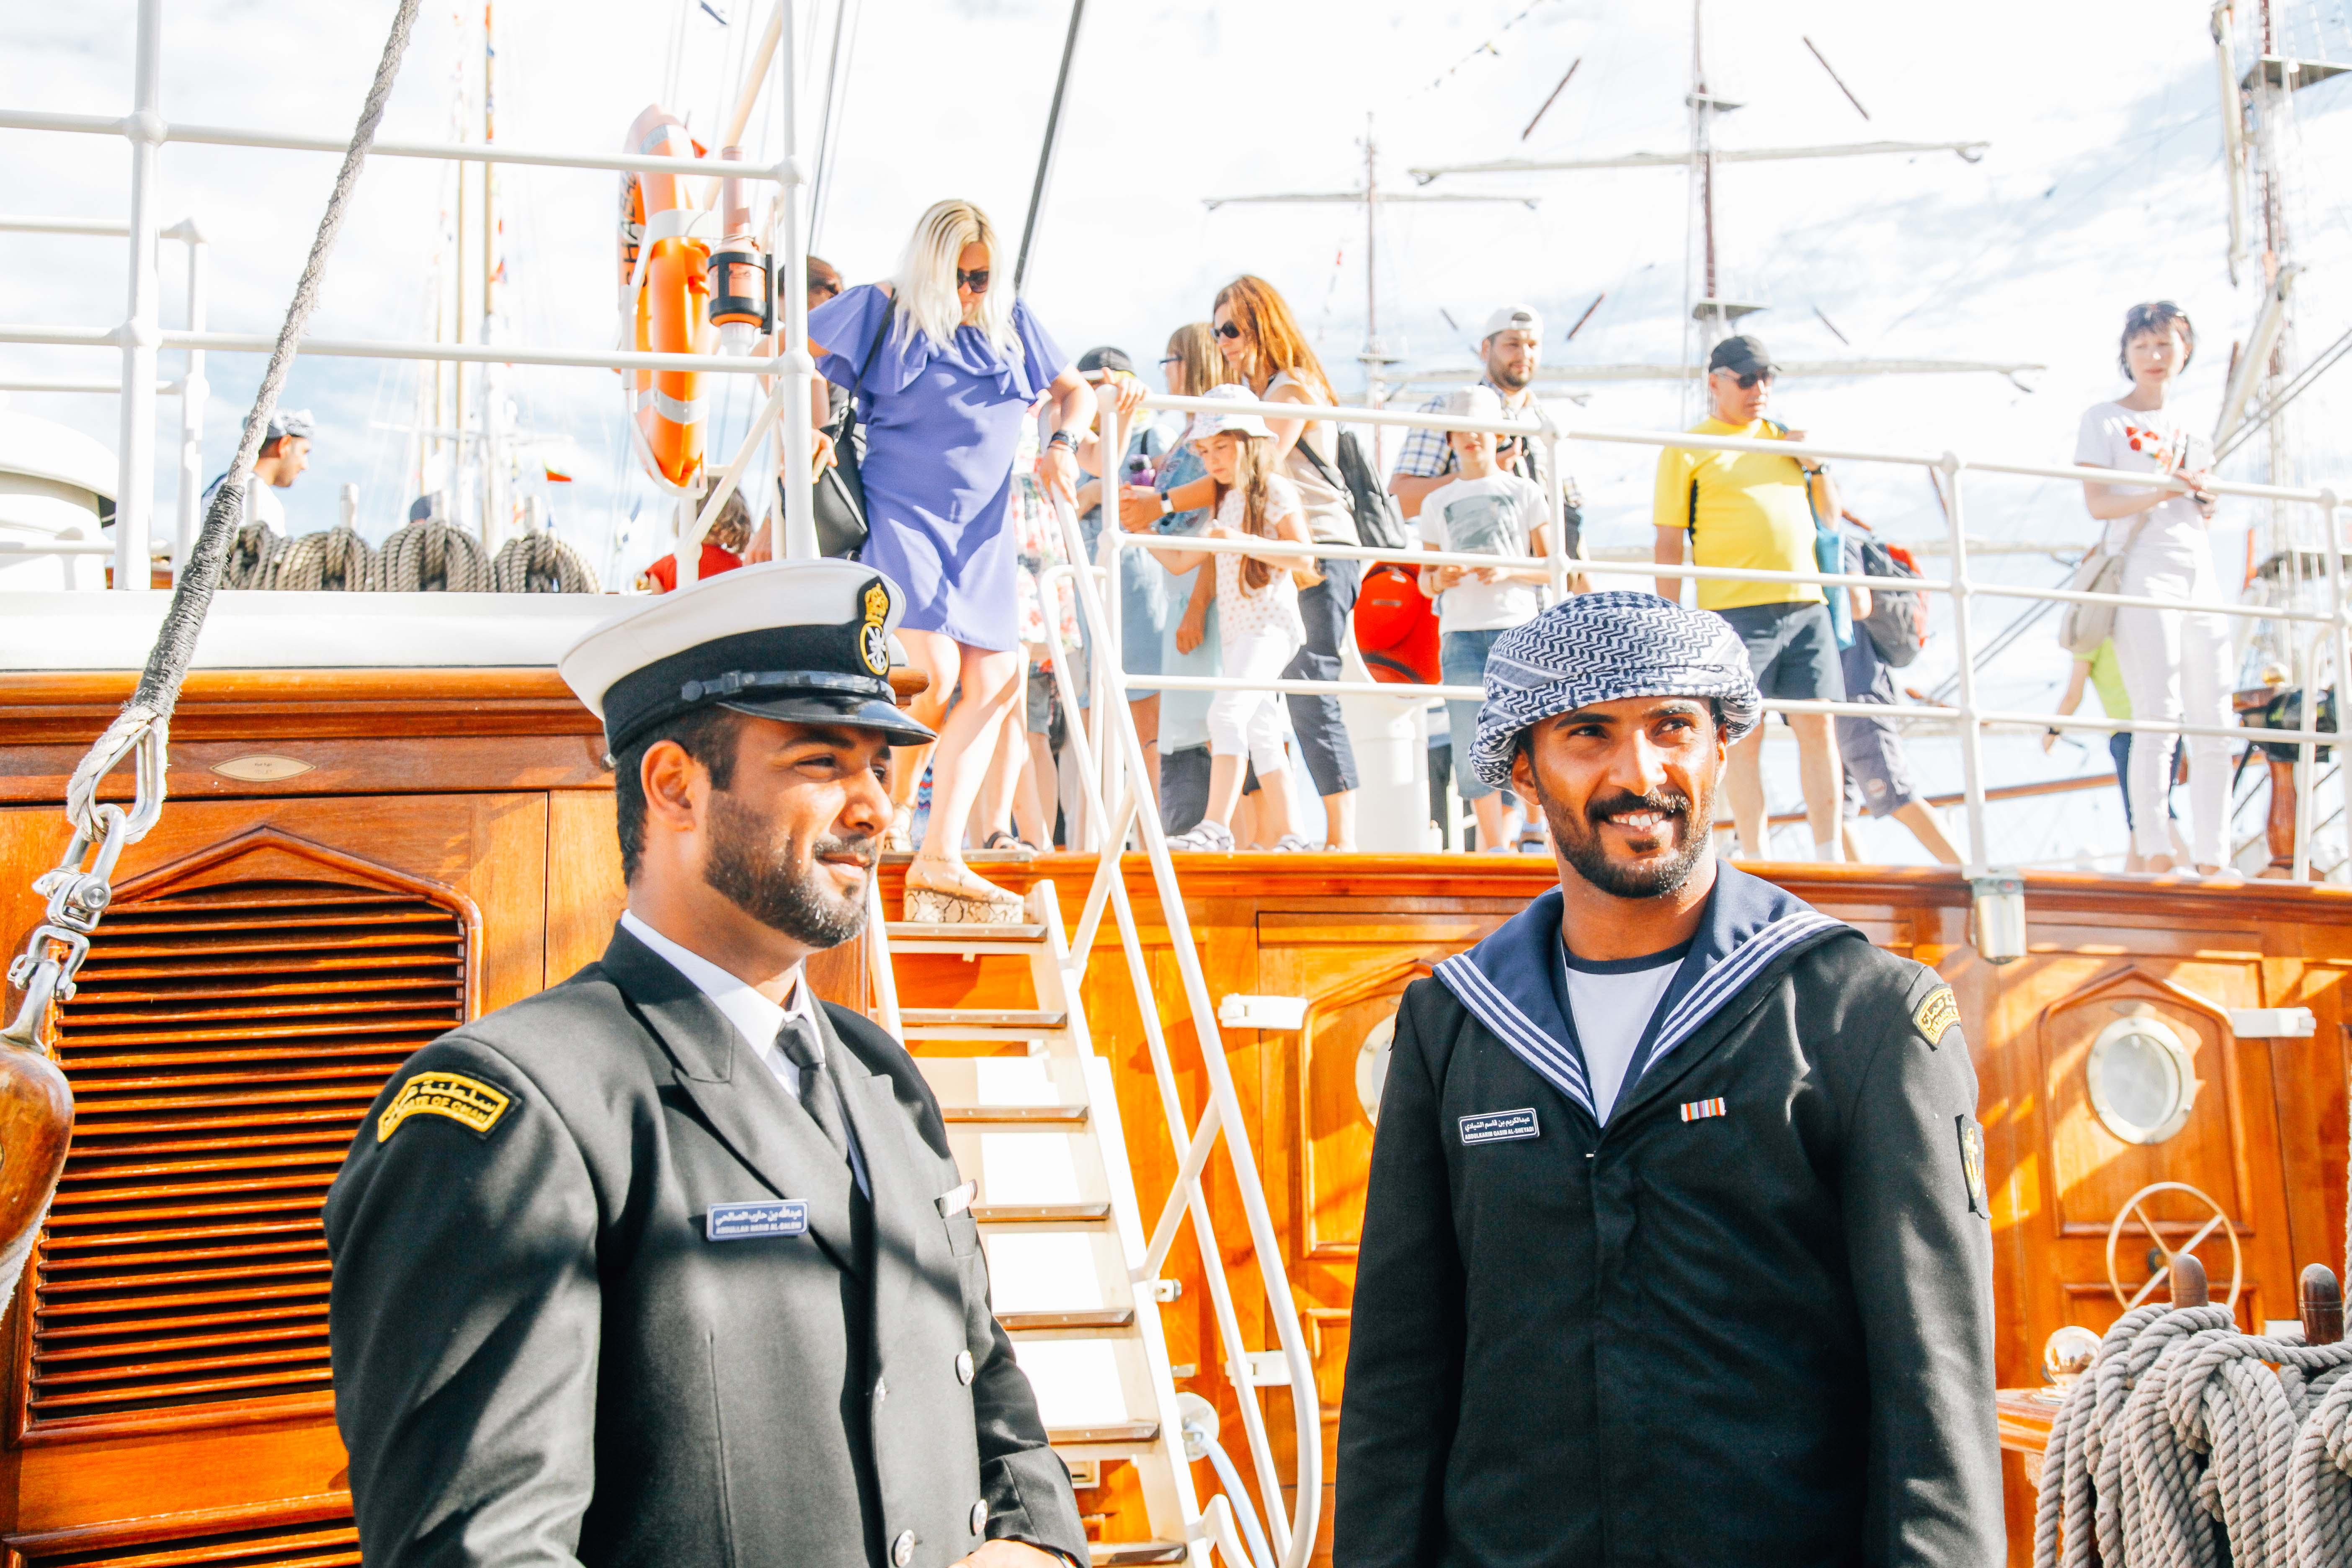 Shabab Oman II: Representing Oman's heritage and tradition